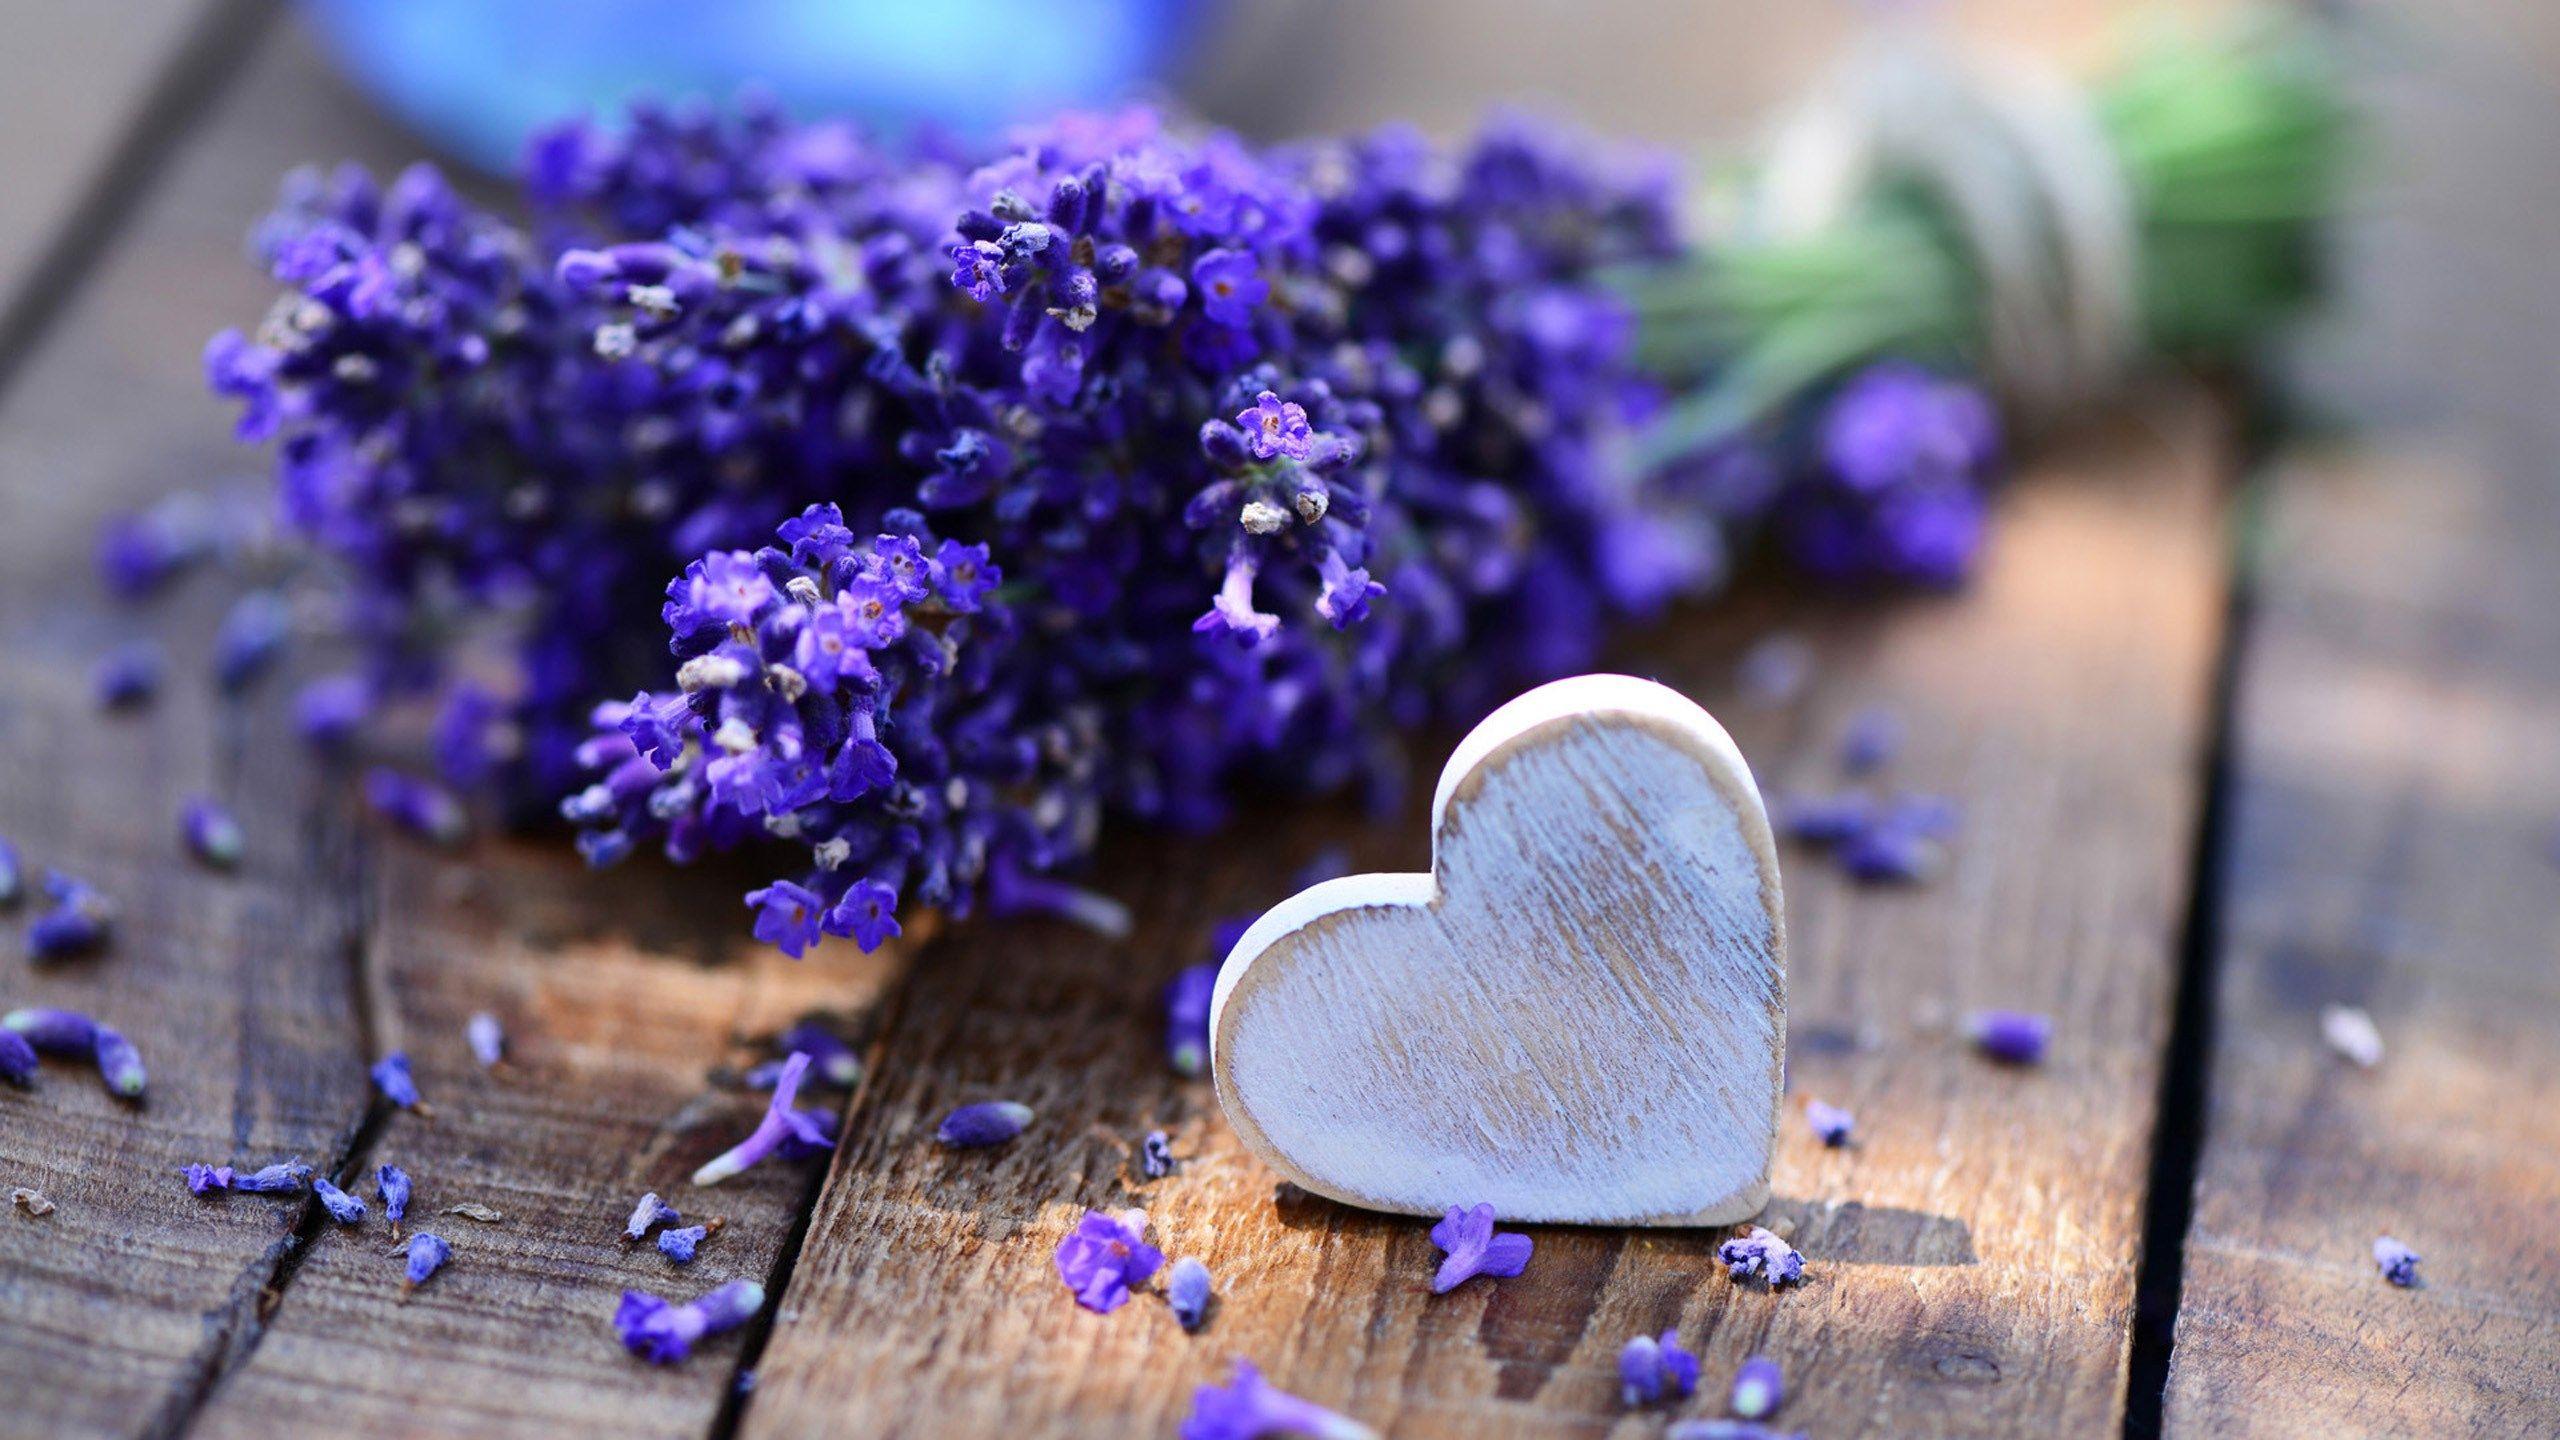 Beautiful Lavender Wallpaper Lavender Heart Lavender Flowers Lavender